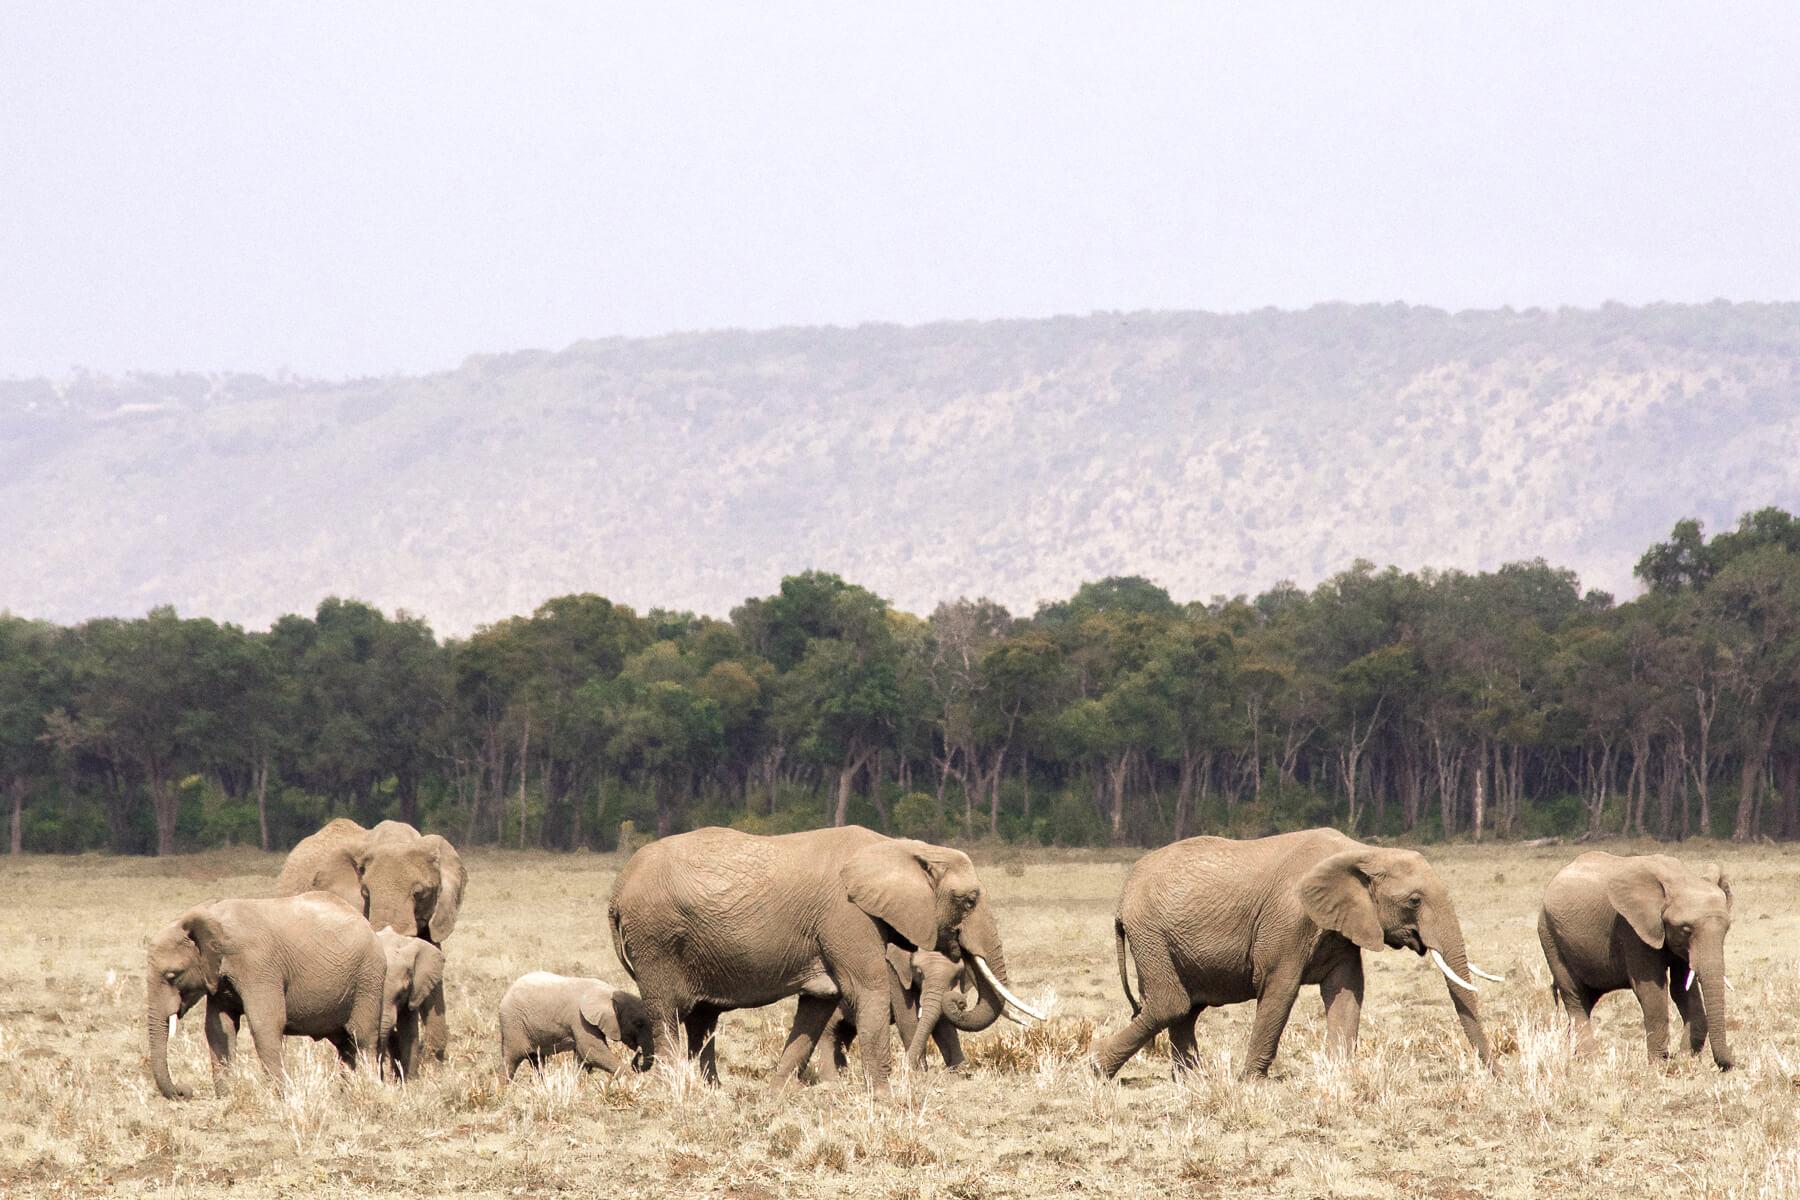 A big herd of 8 elephants walking along the plains of the Maasai Mara